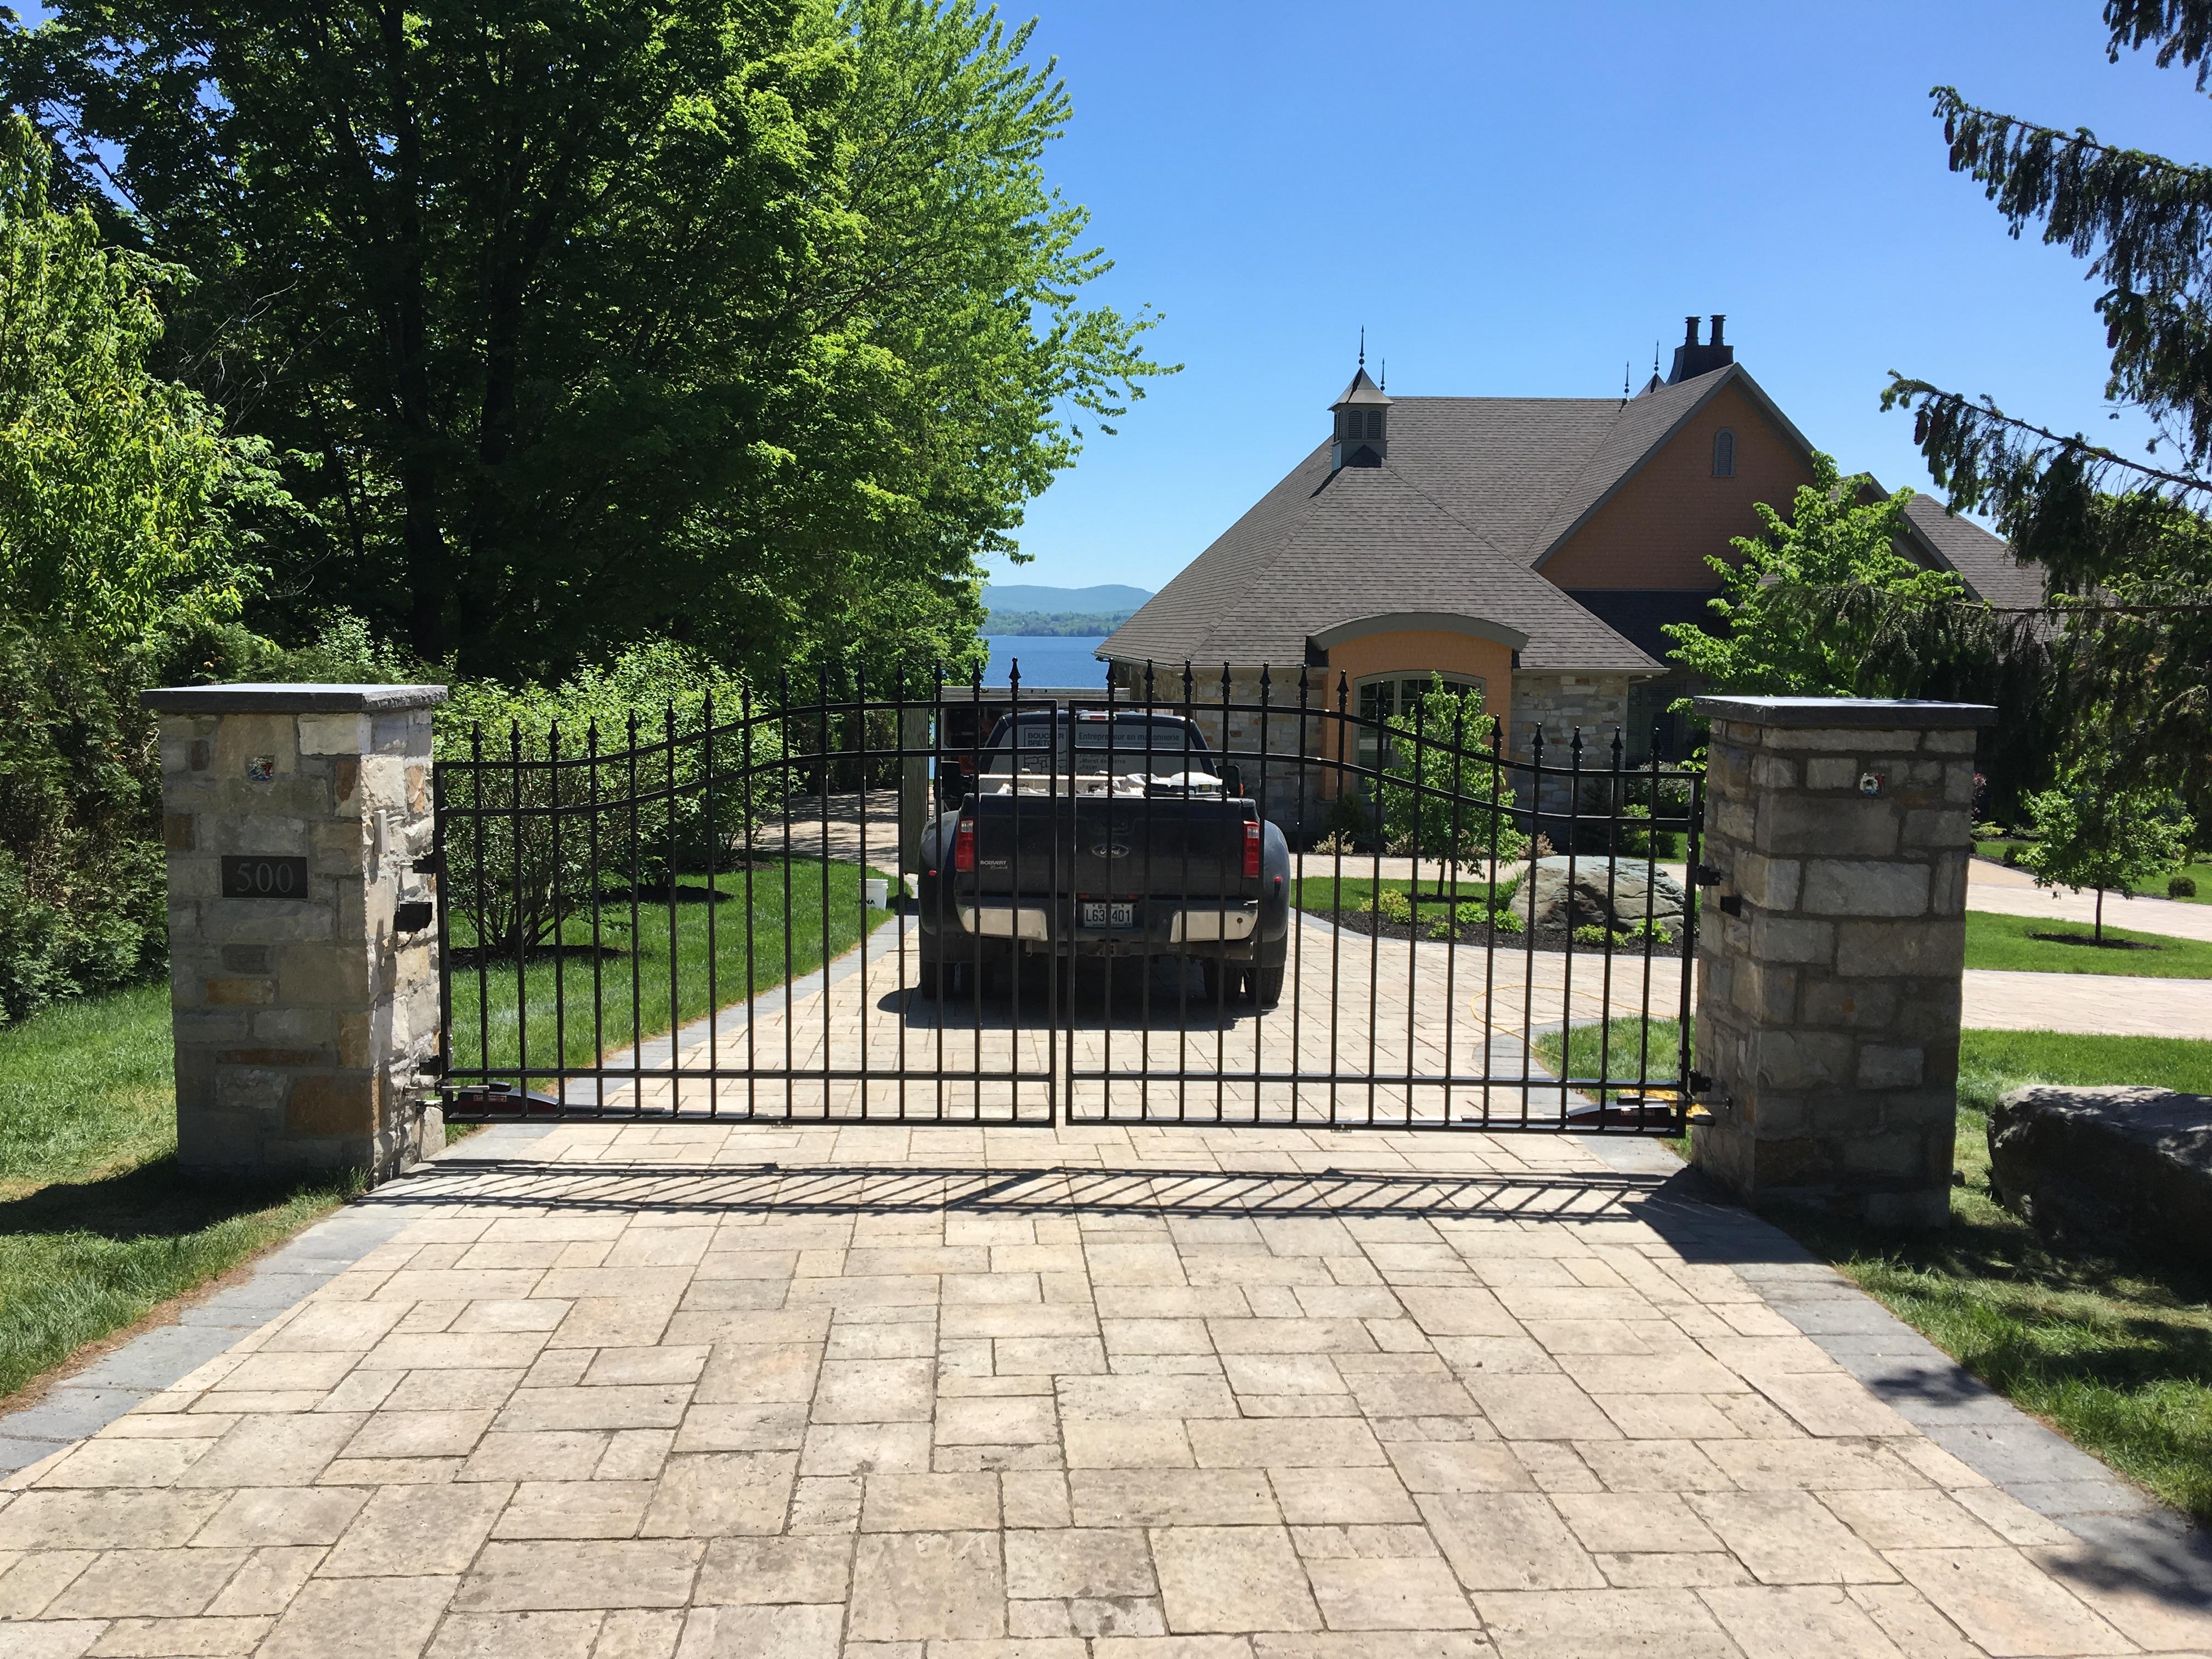 #26 | Double arch gates